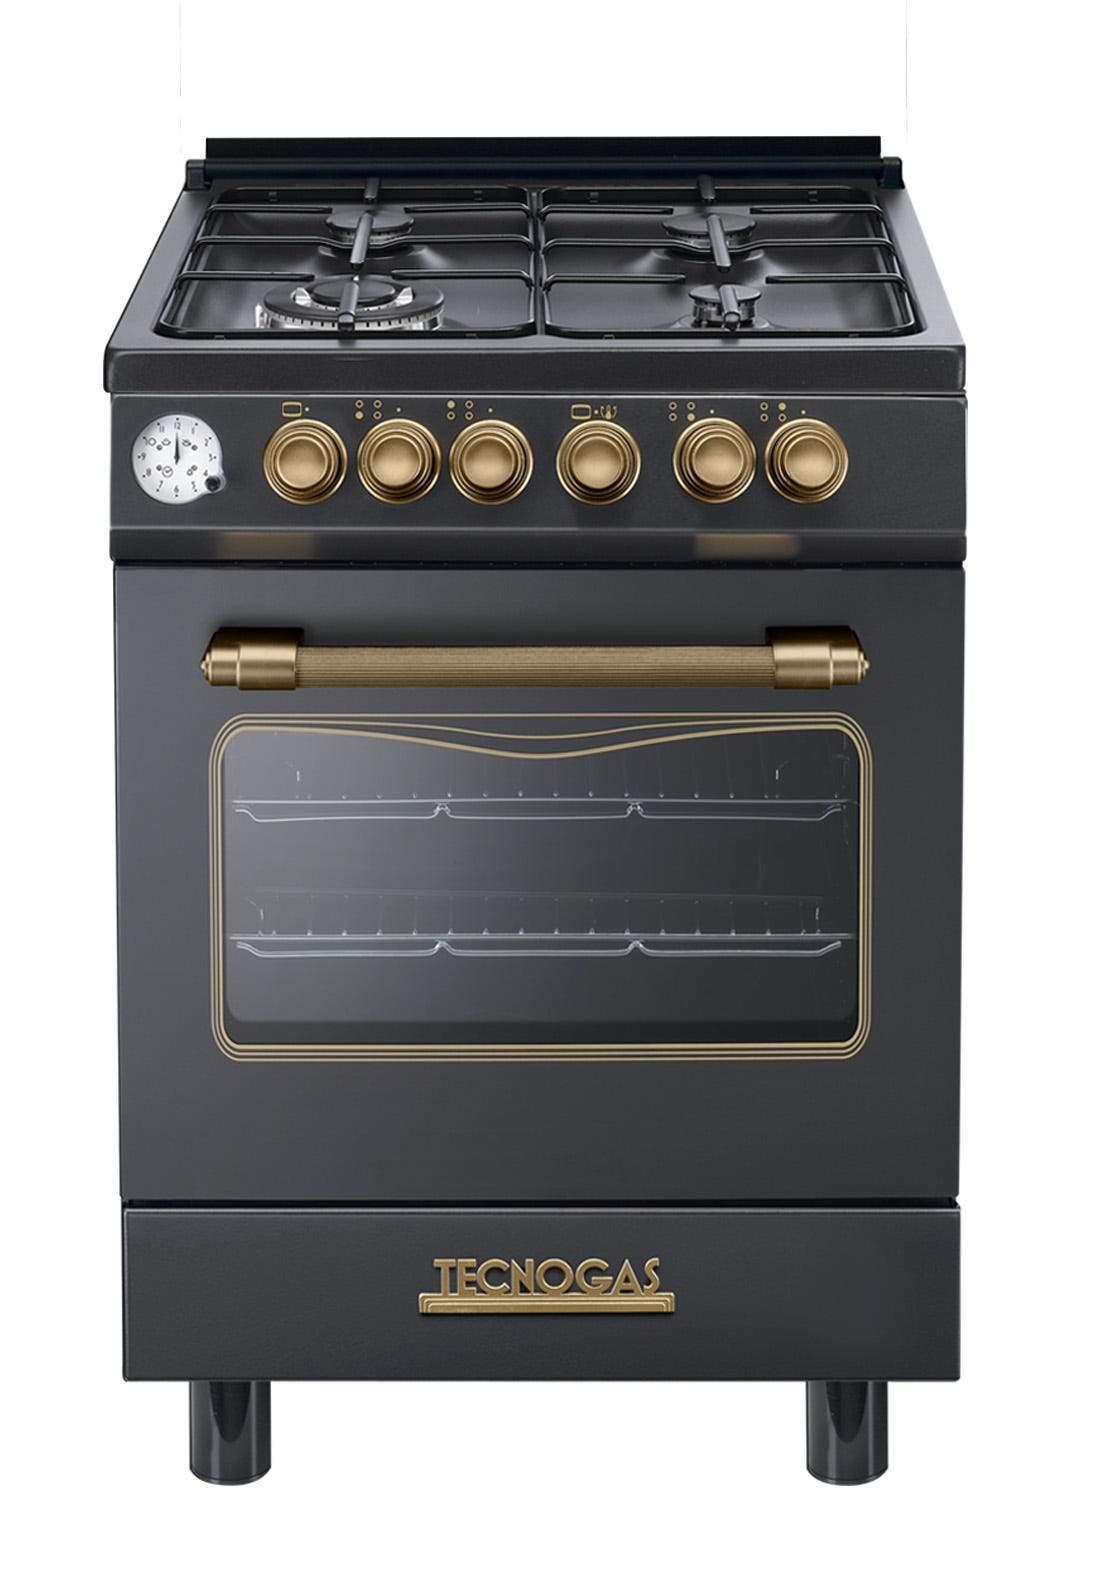 Tecnogas Cooker - D3BO66G4VC